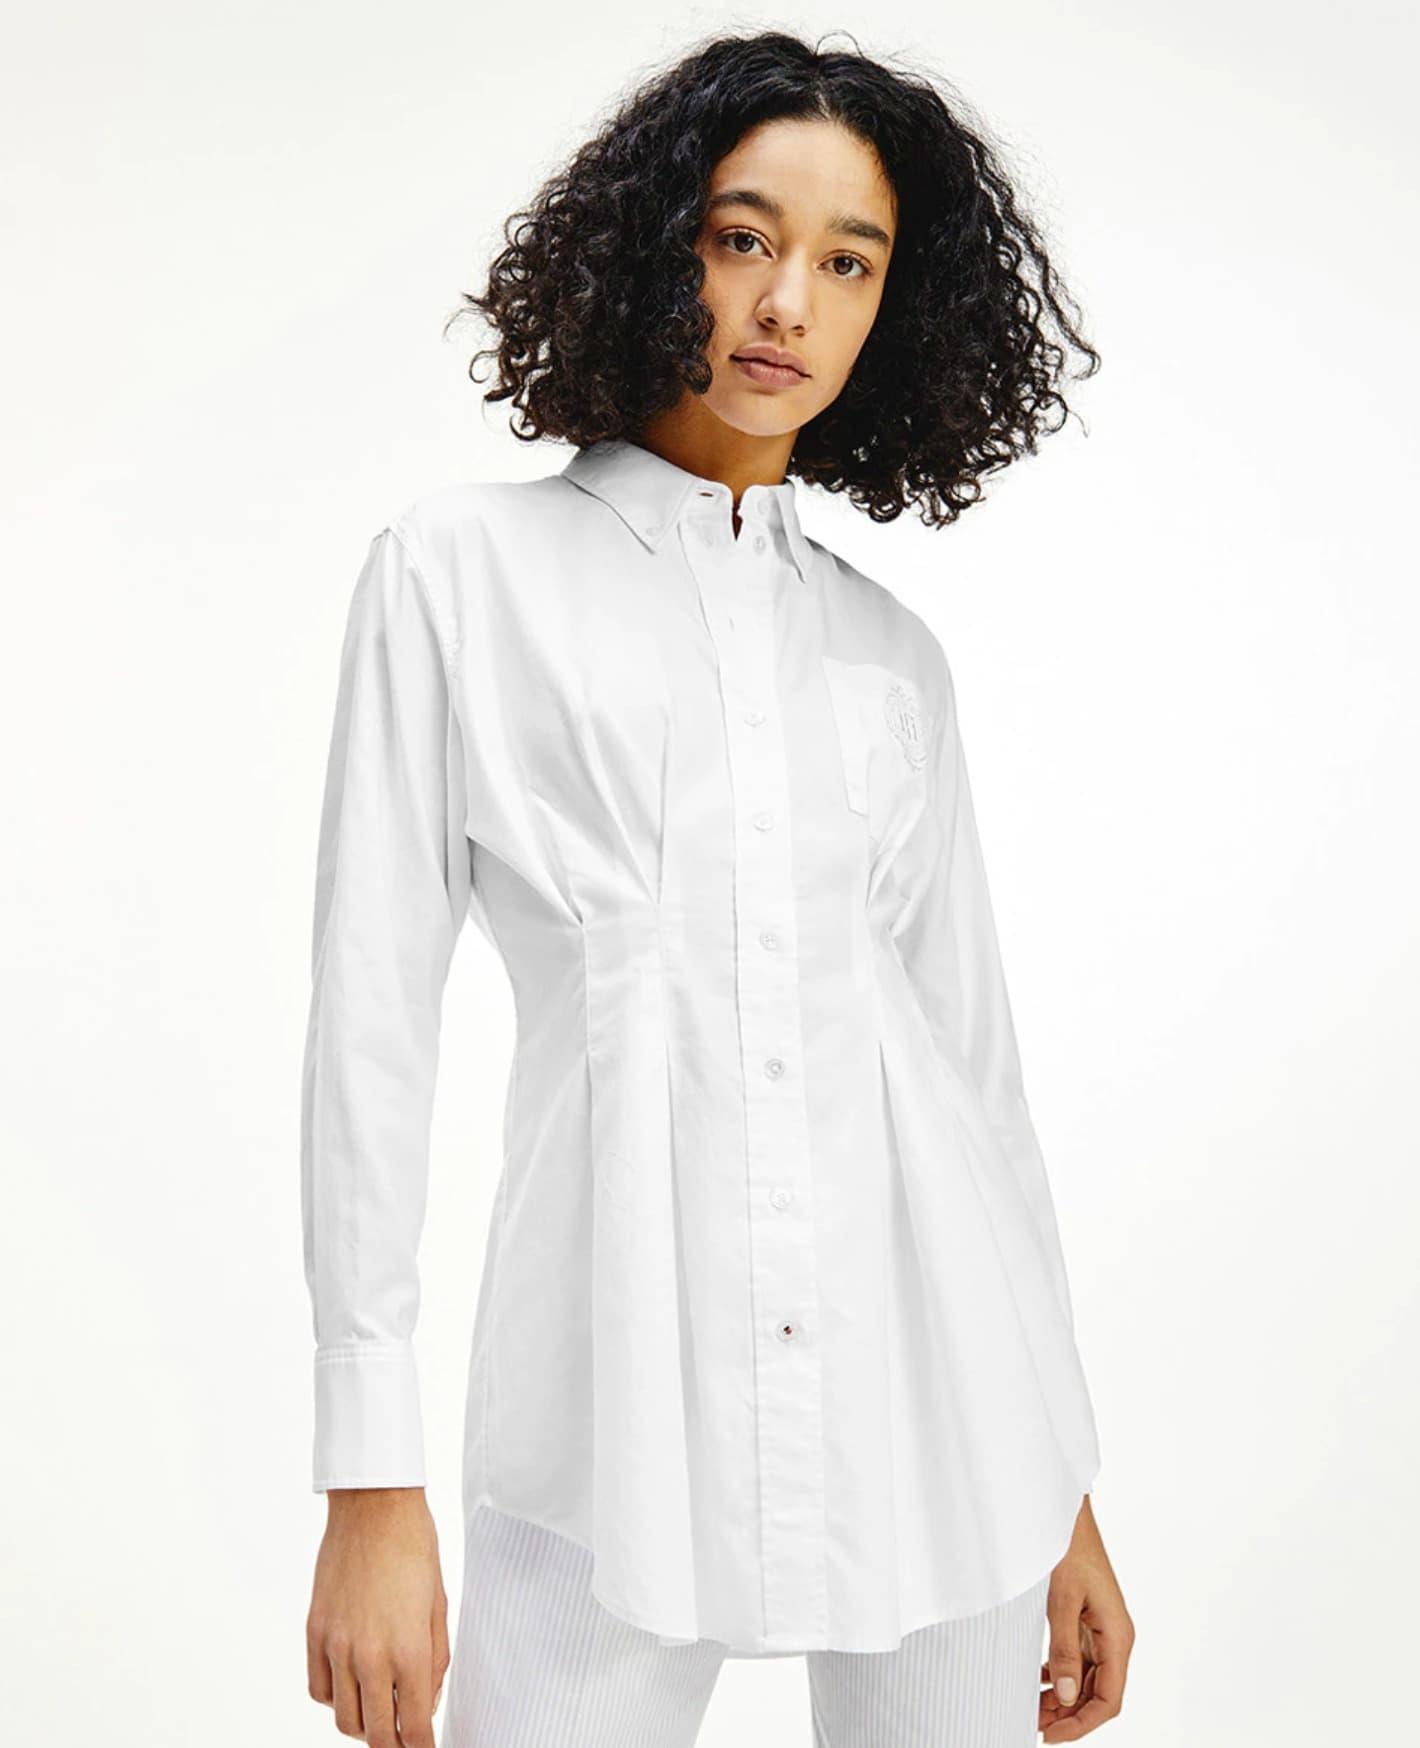 Camisa de mujer de algodón con manga larga